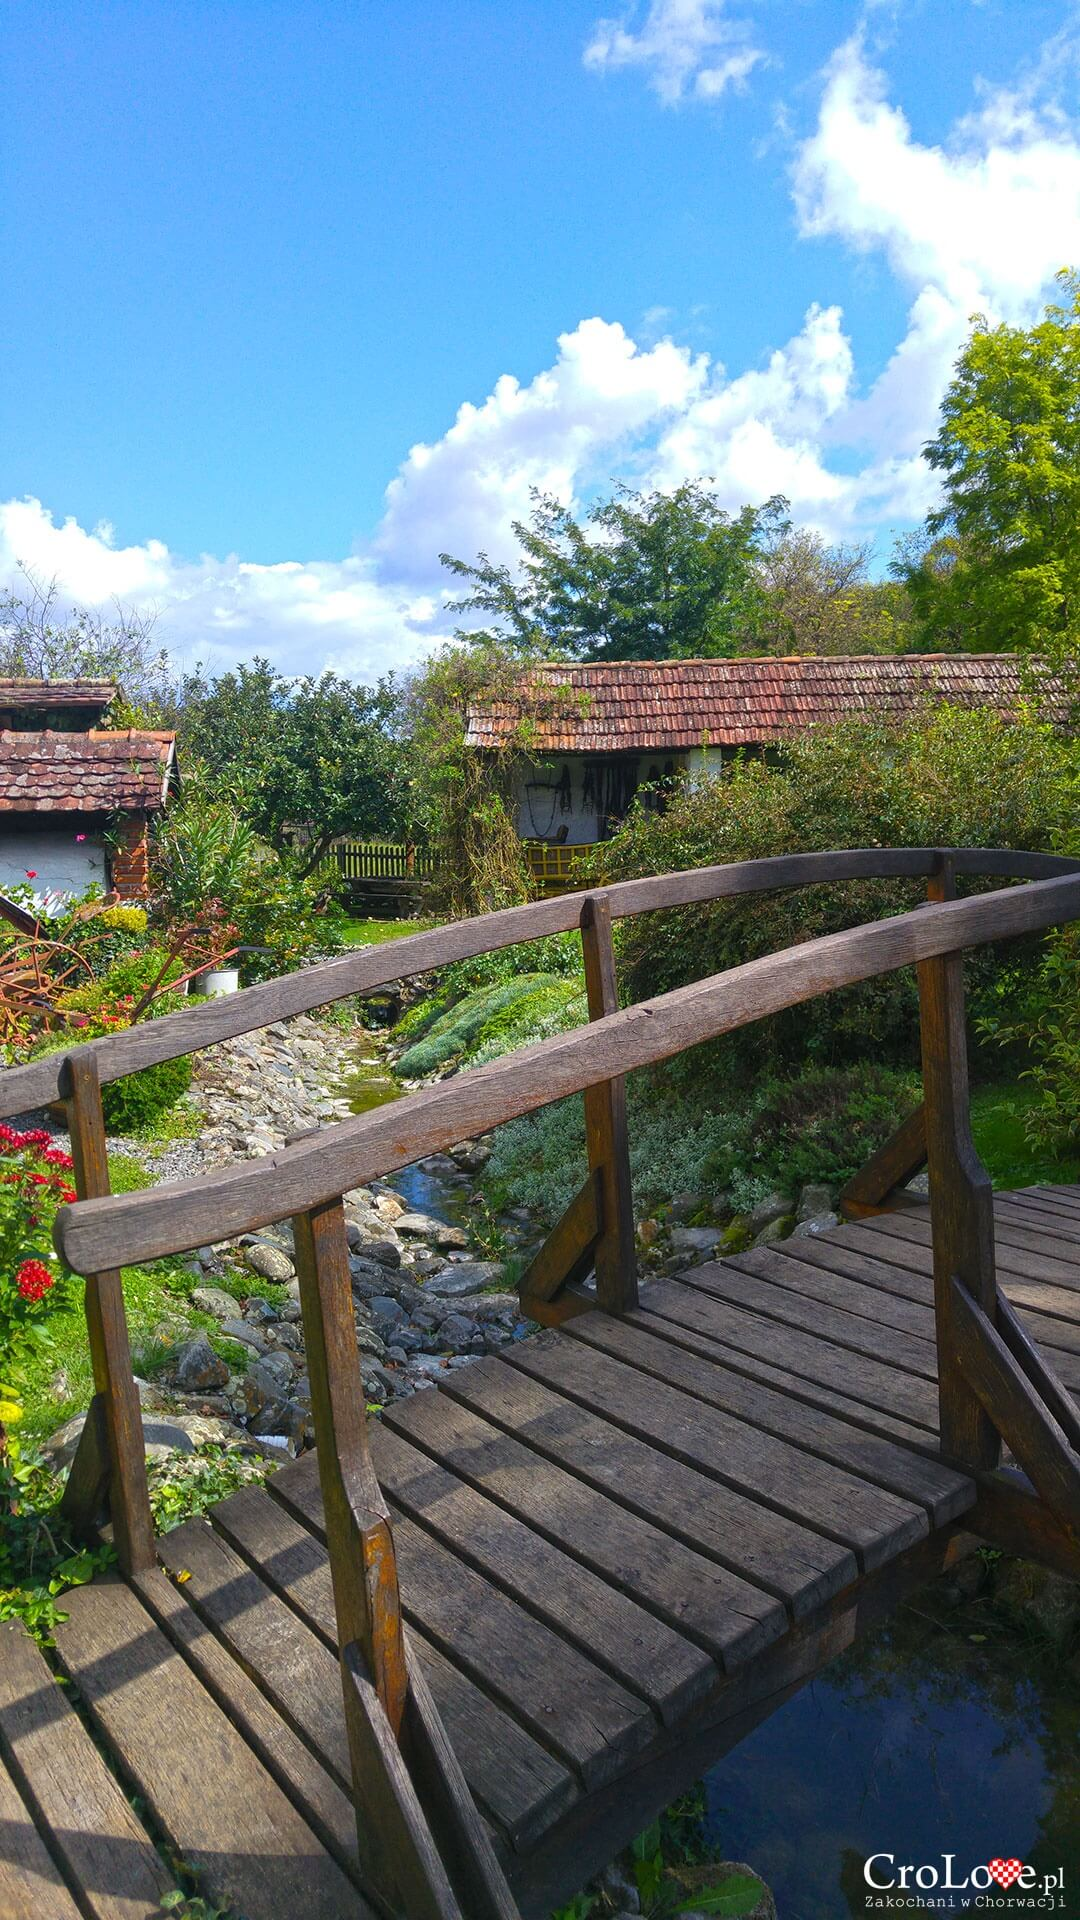 Eko-Etno wioska w Starej Kapeli, Slavonia